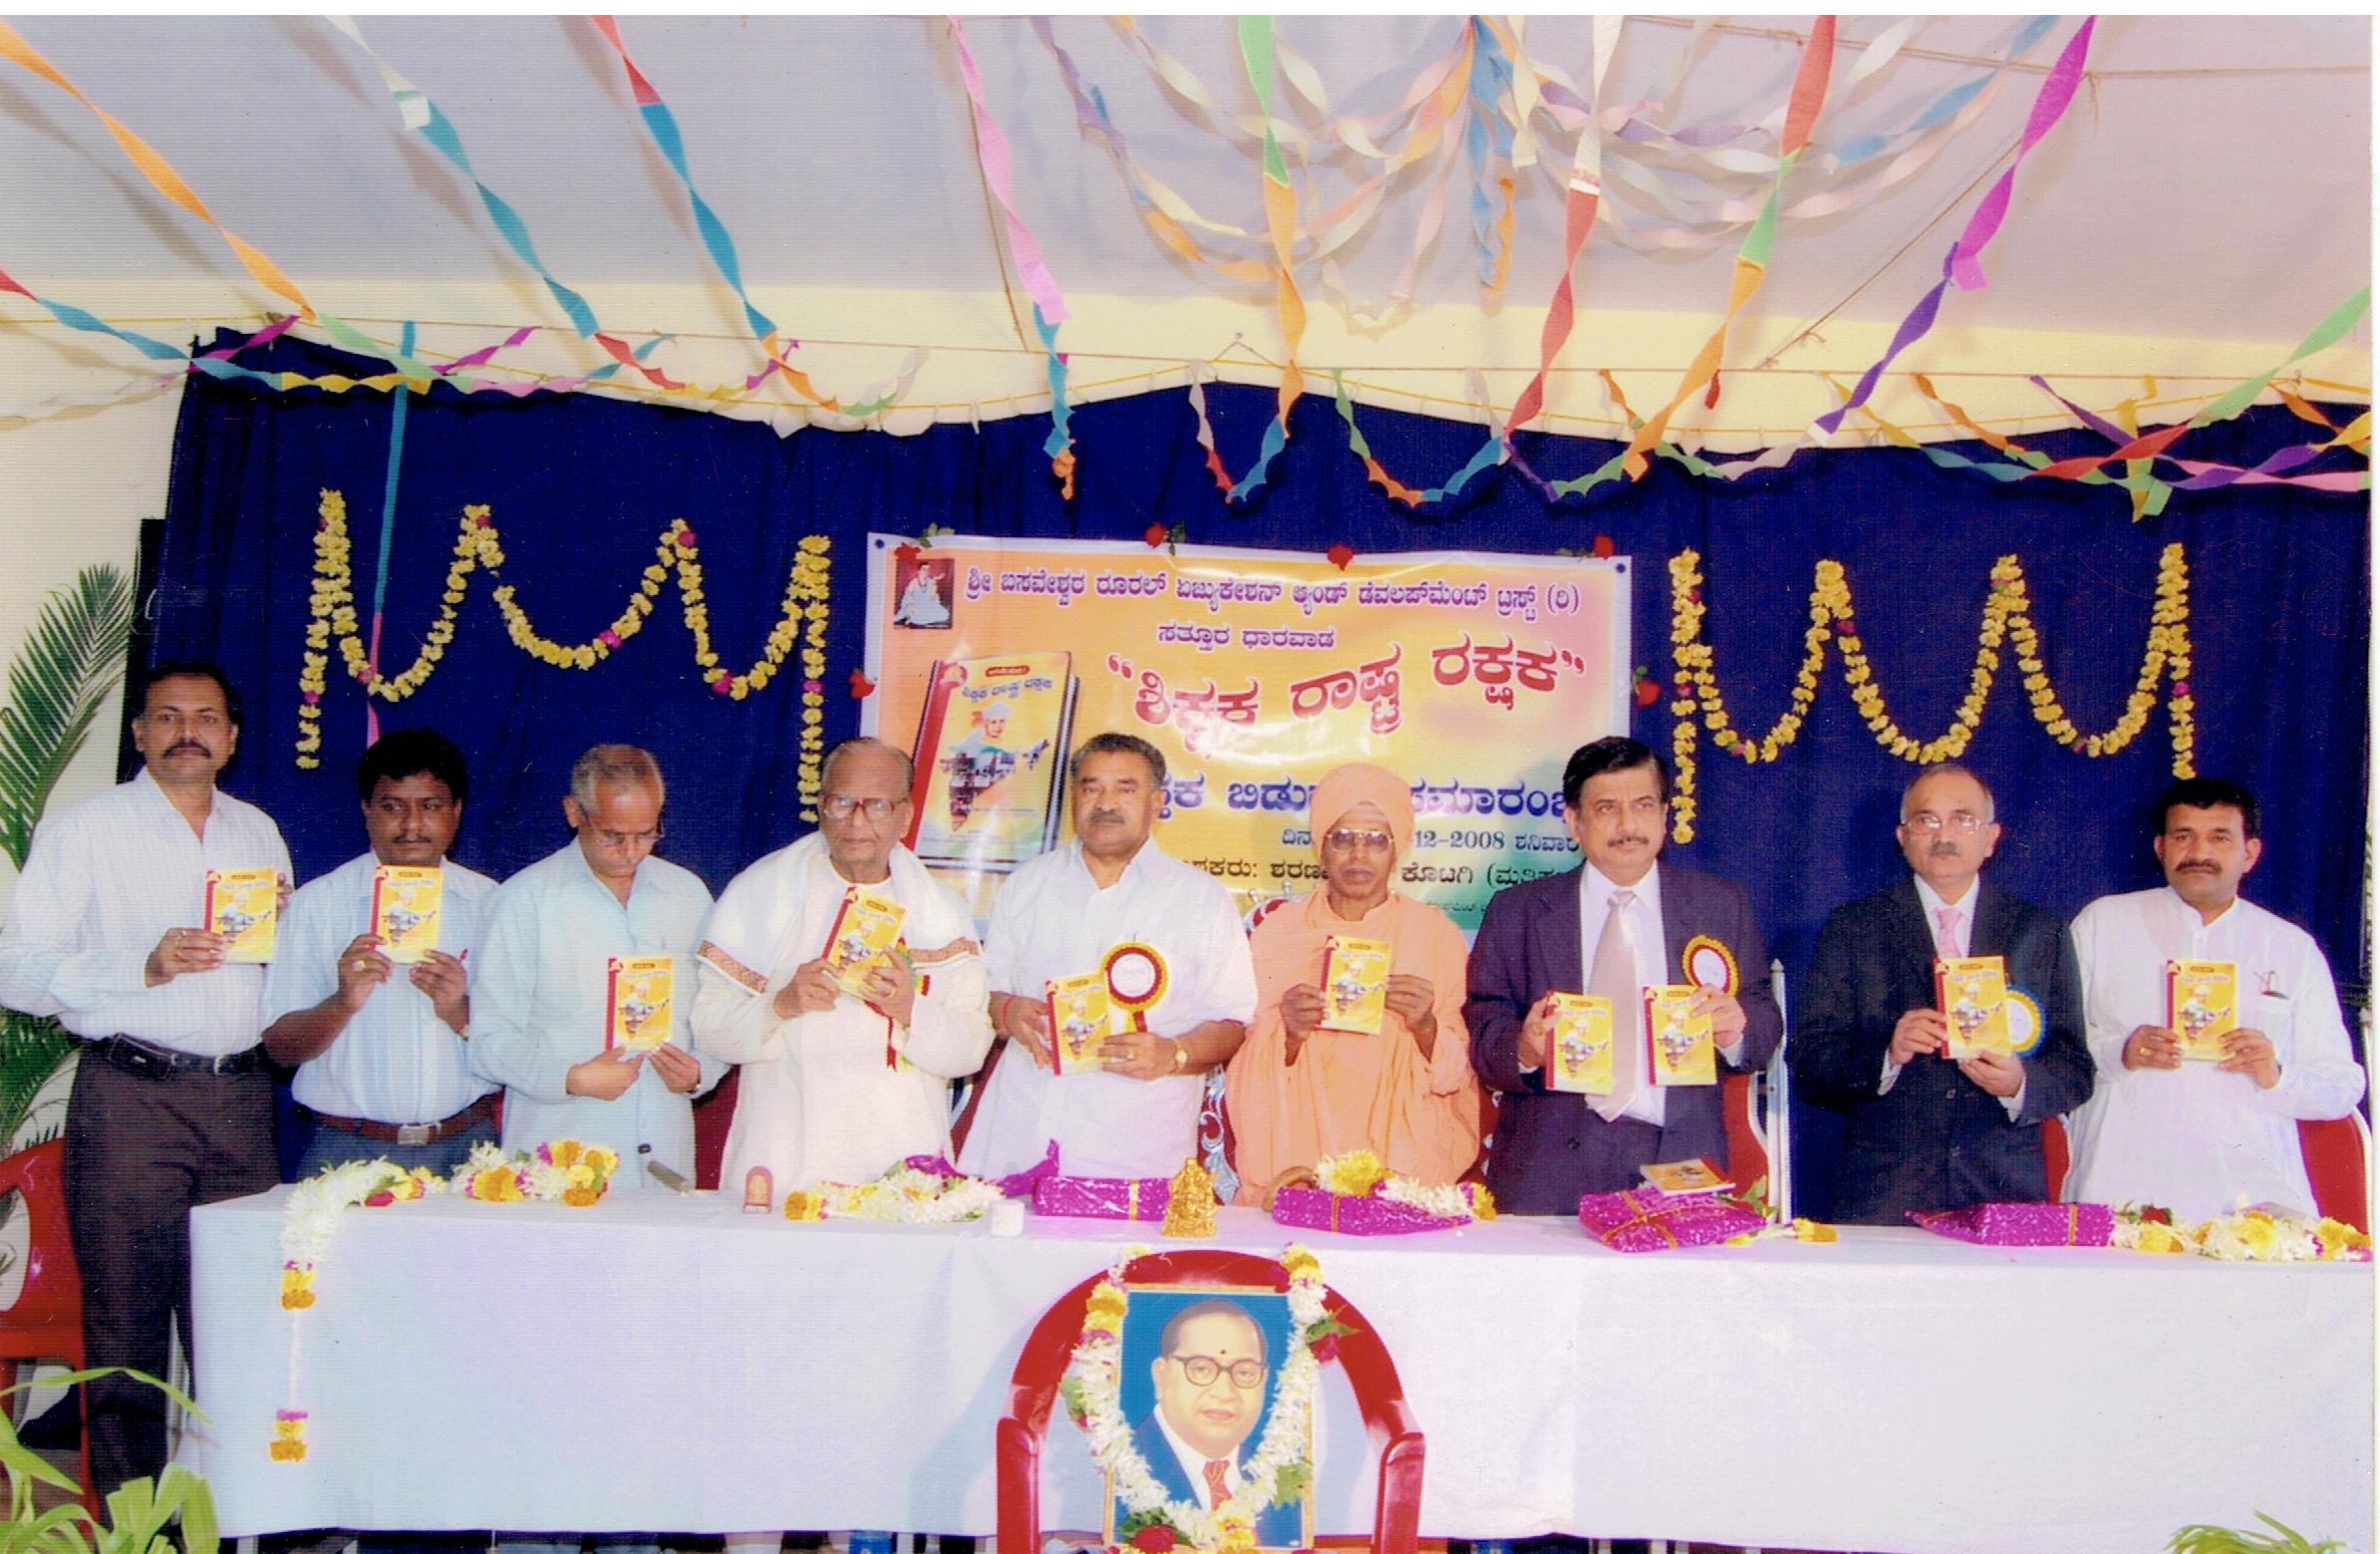 Sri Basaveshwar Rural Education And Development Trust Sri Sathya Sai College Of Homeopathic Medical Sciences Image